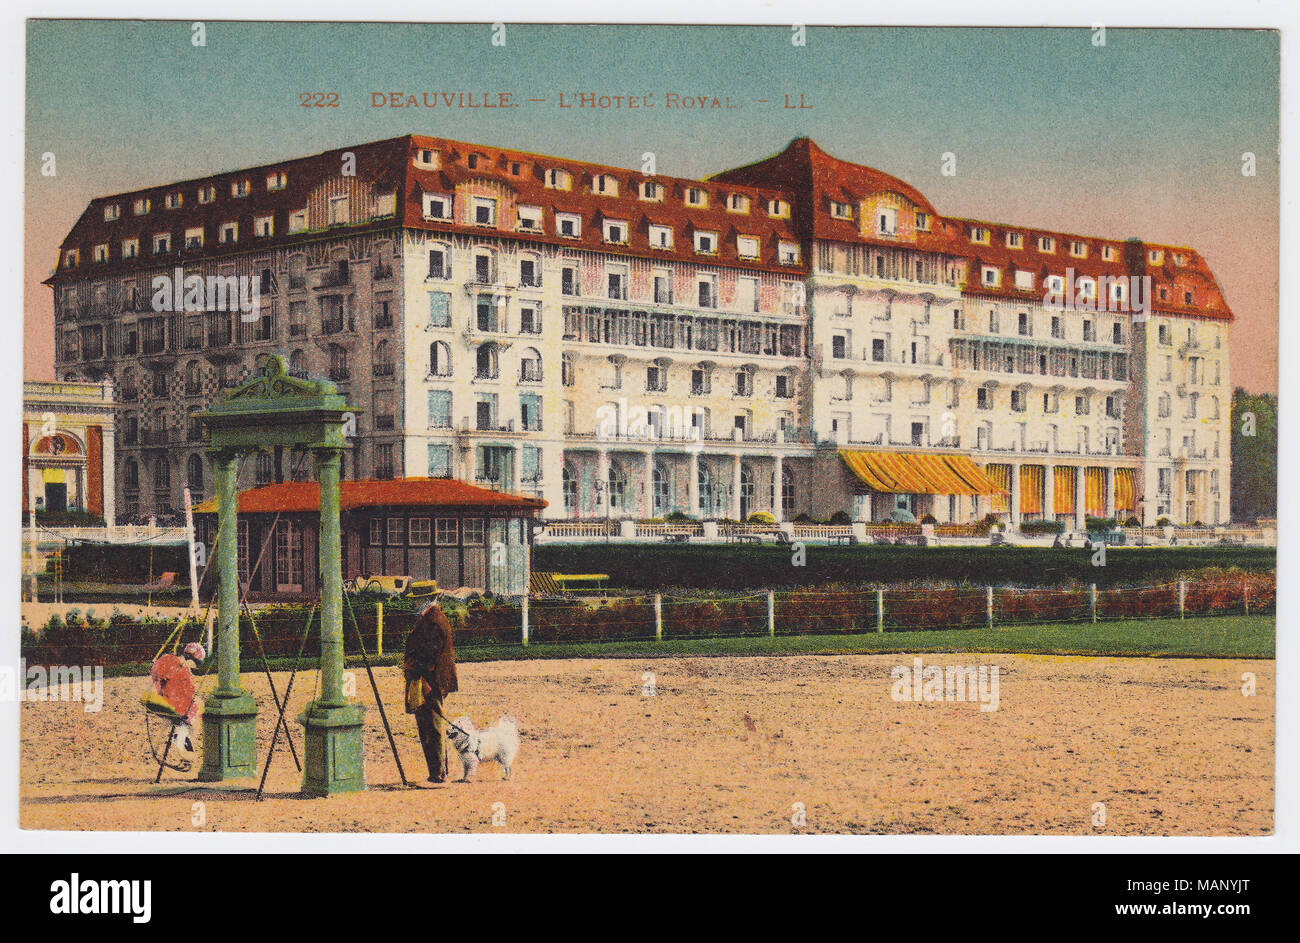 Royal Hôtel, Deauville, France - Stock Image